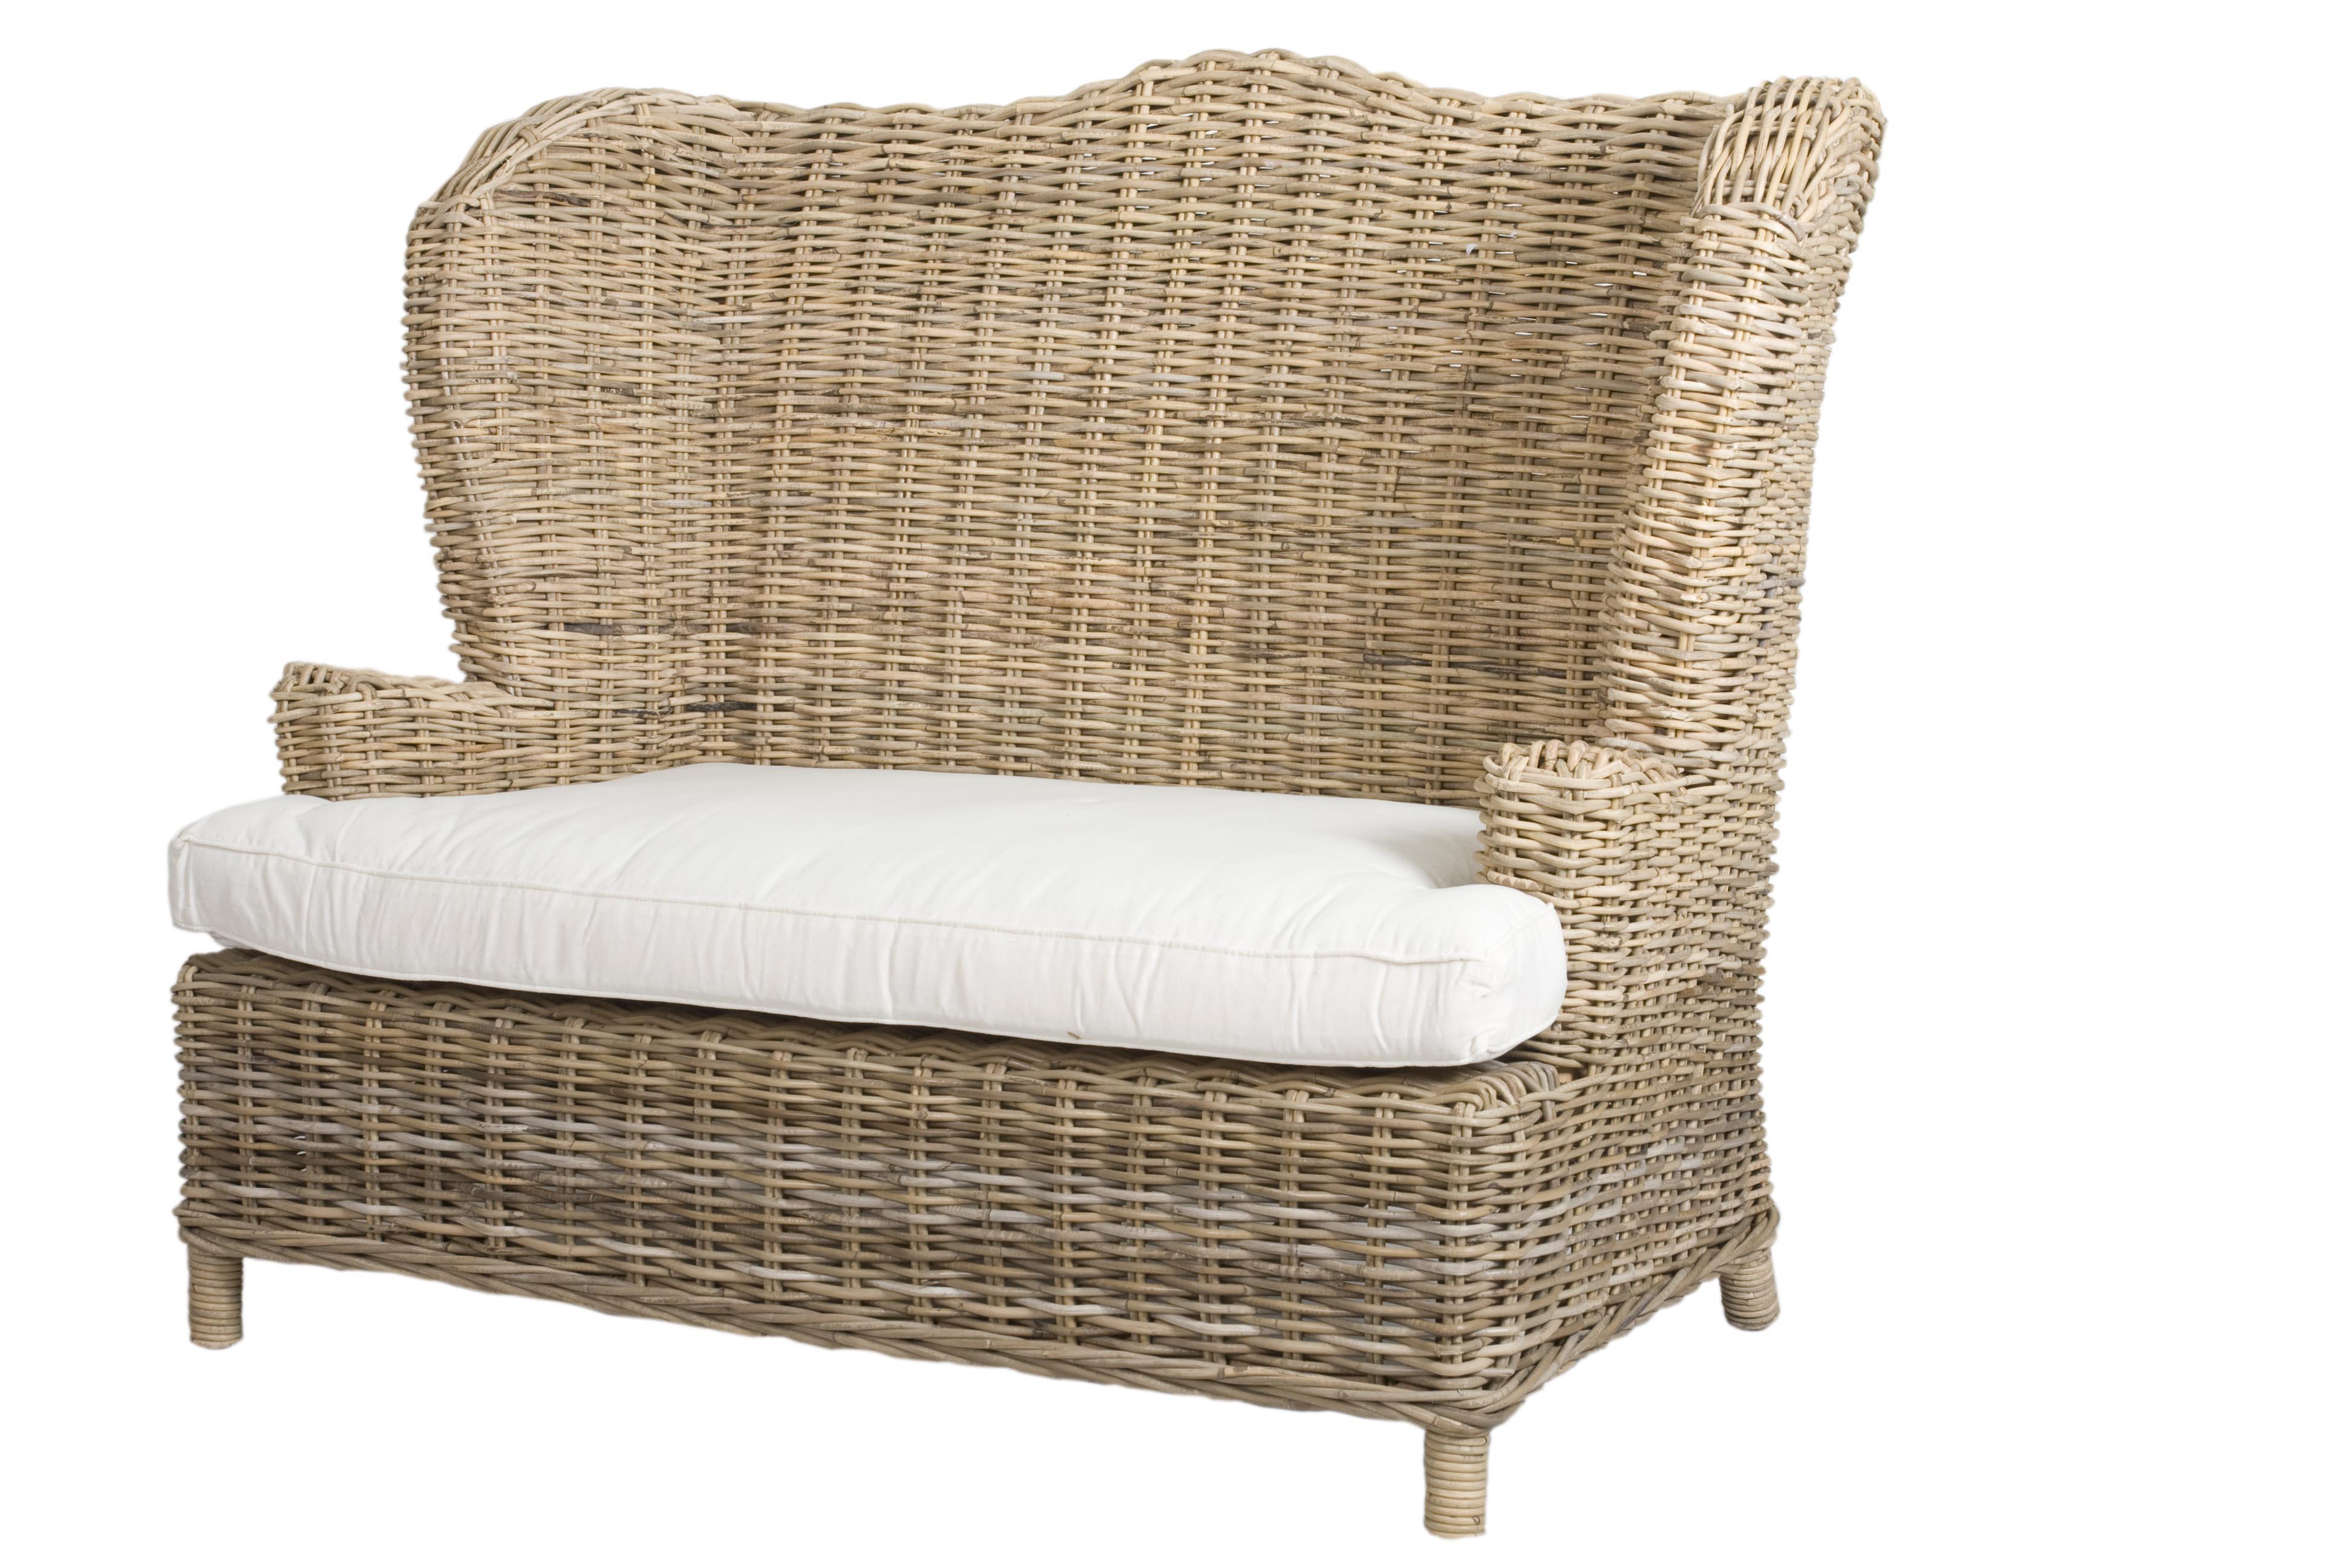 breiter sessel rattan tennessee inklusive kissen. Black Bedroom Furniture Sets. Home Design Ideas